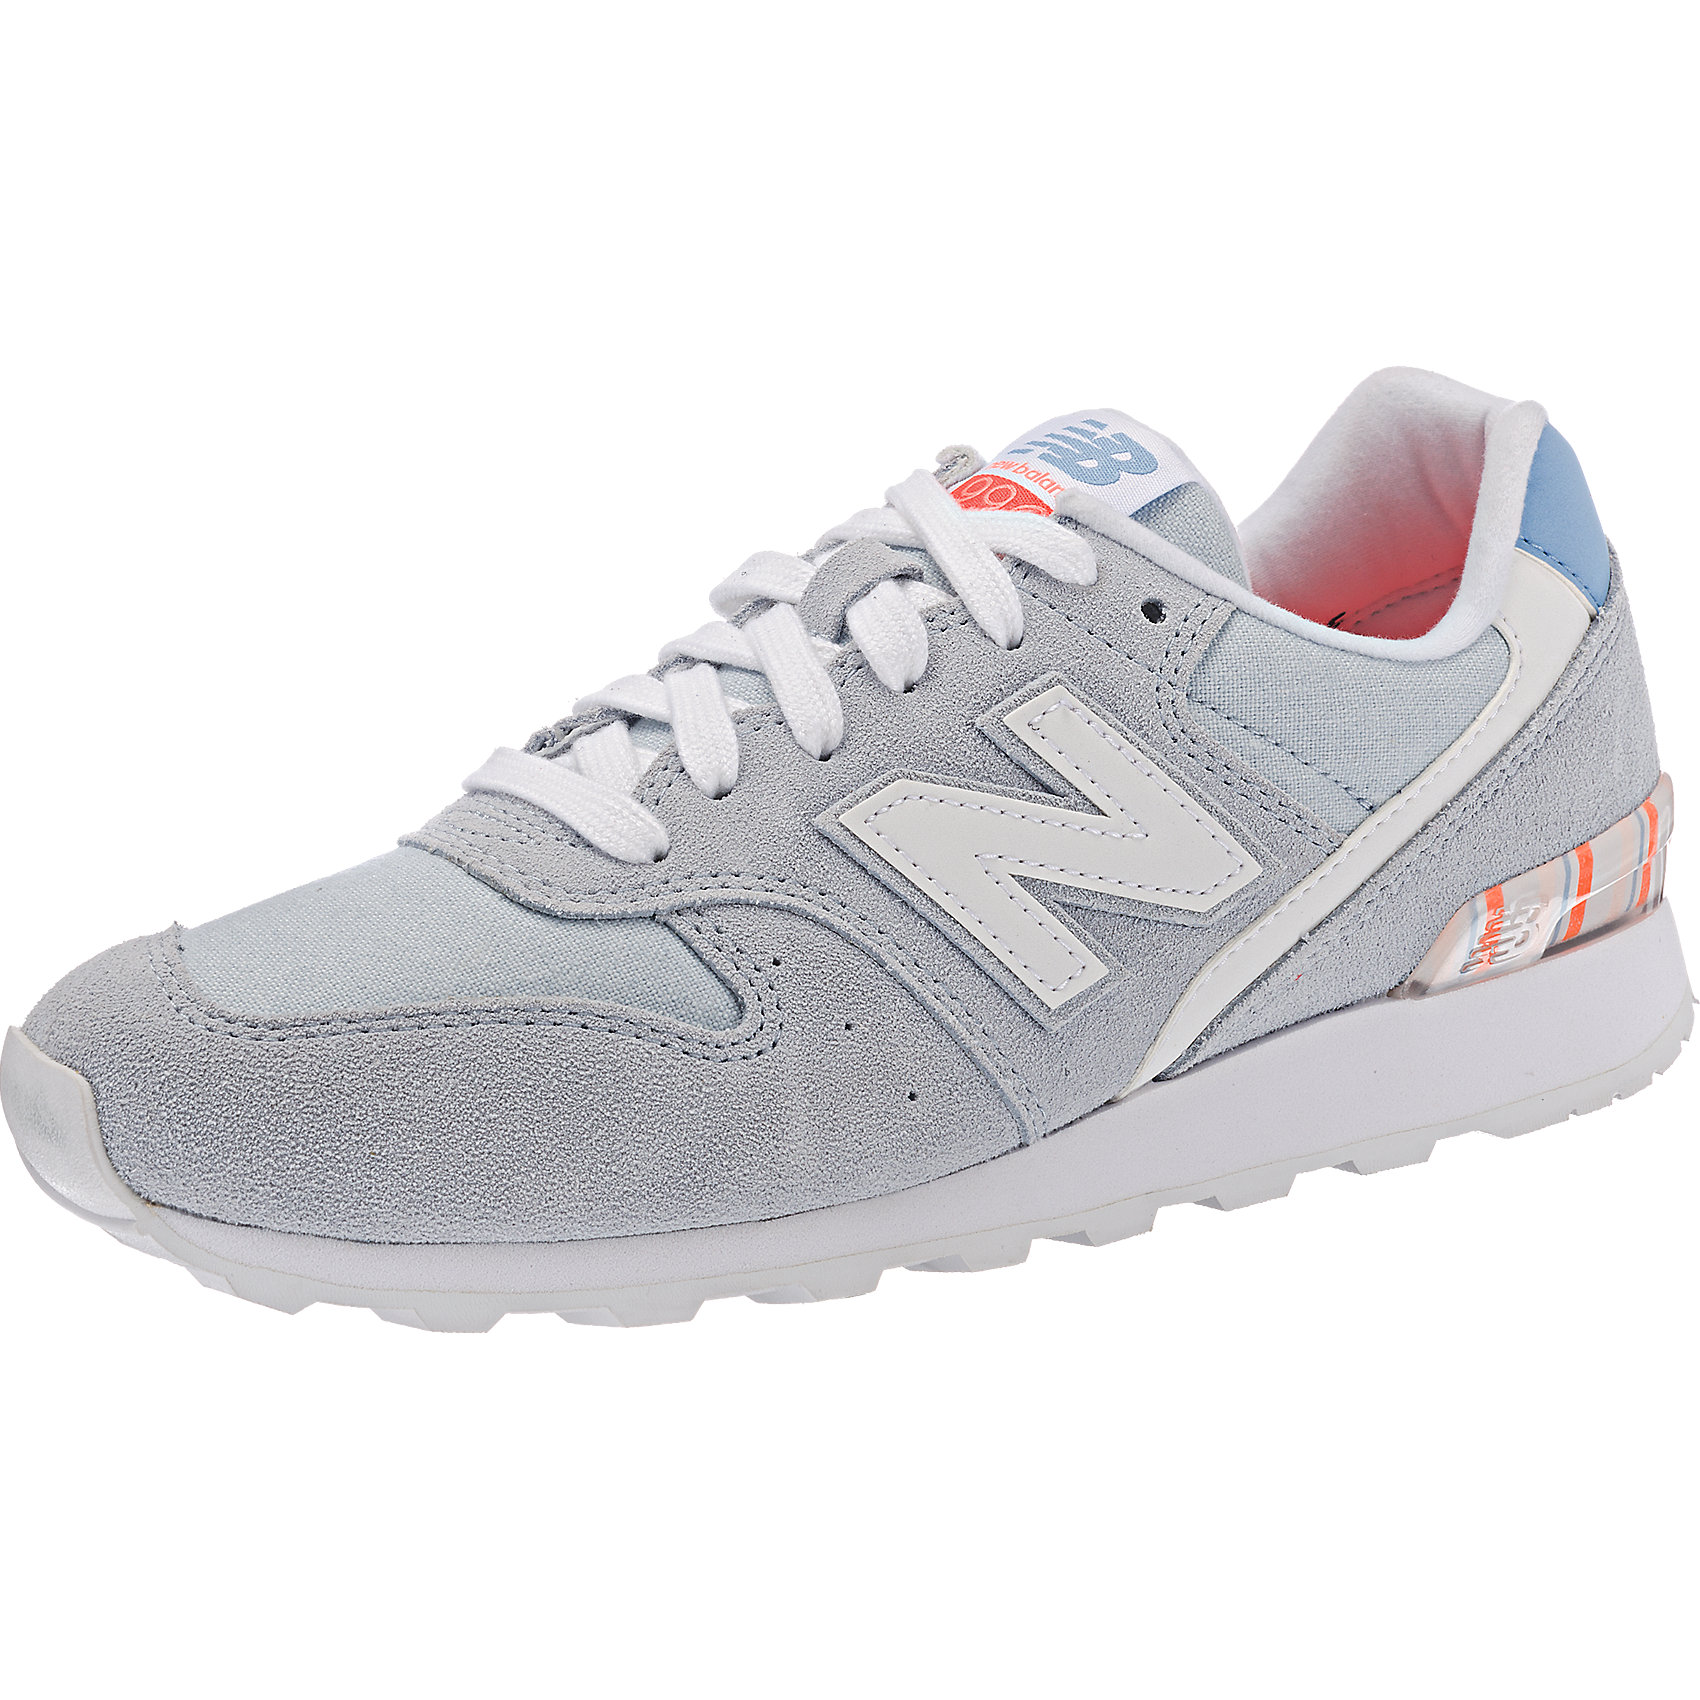 Details zu Neu new balance WR996 D Sneakers rosa beige kombi blau 5770630